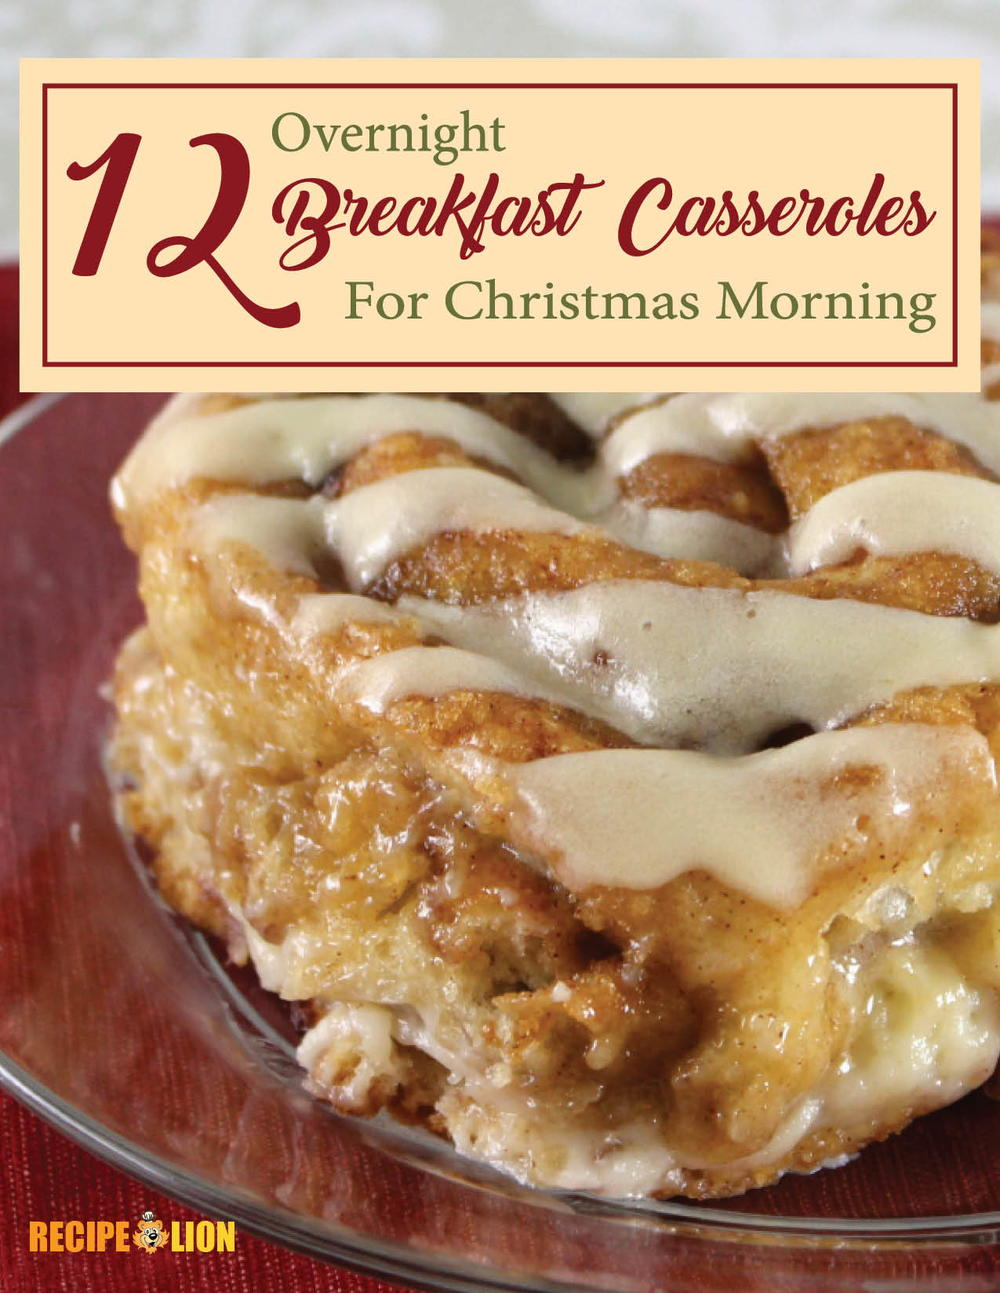 12 overnight breakfast casseroles for christmas morning ecookbook 12 overnight breakfast casseroles for christmas morning ecookbook recipelion forumfinder Gallery